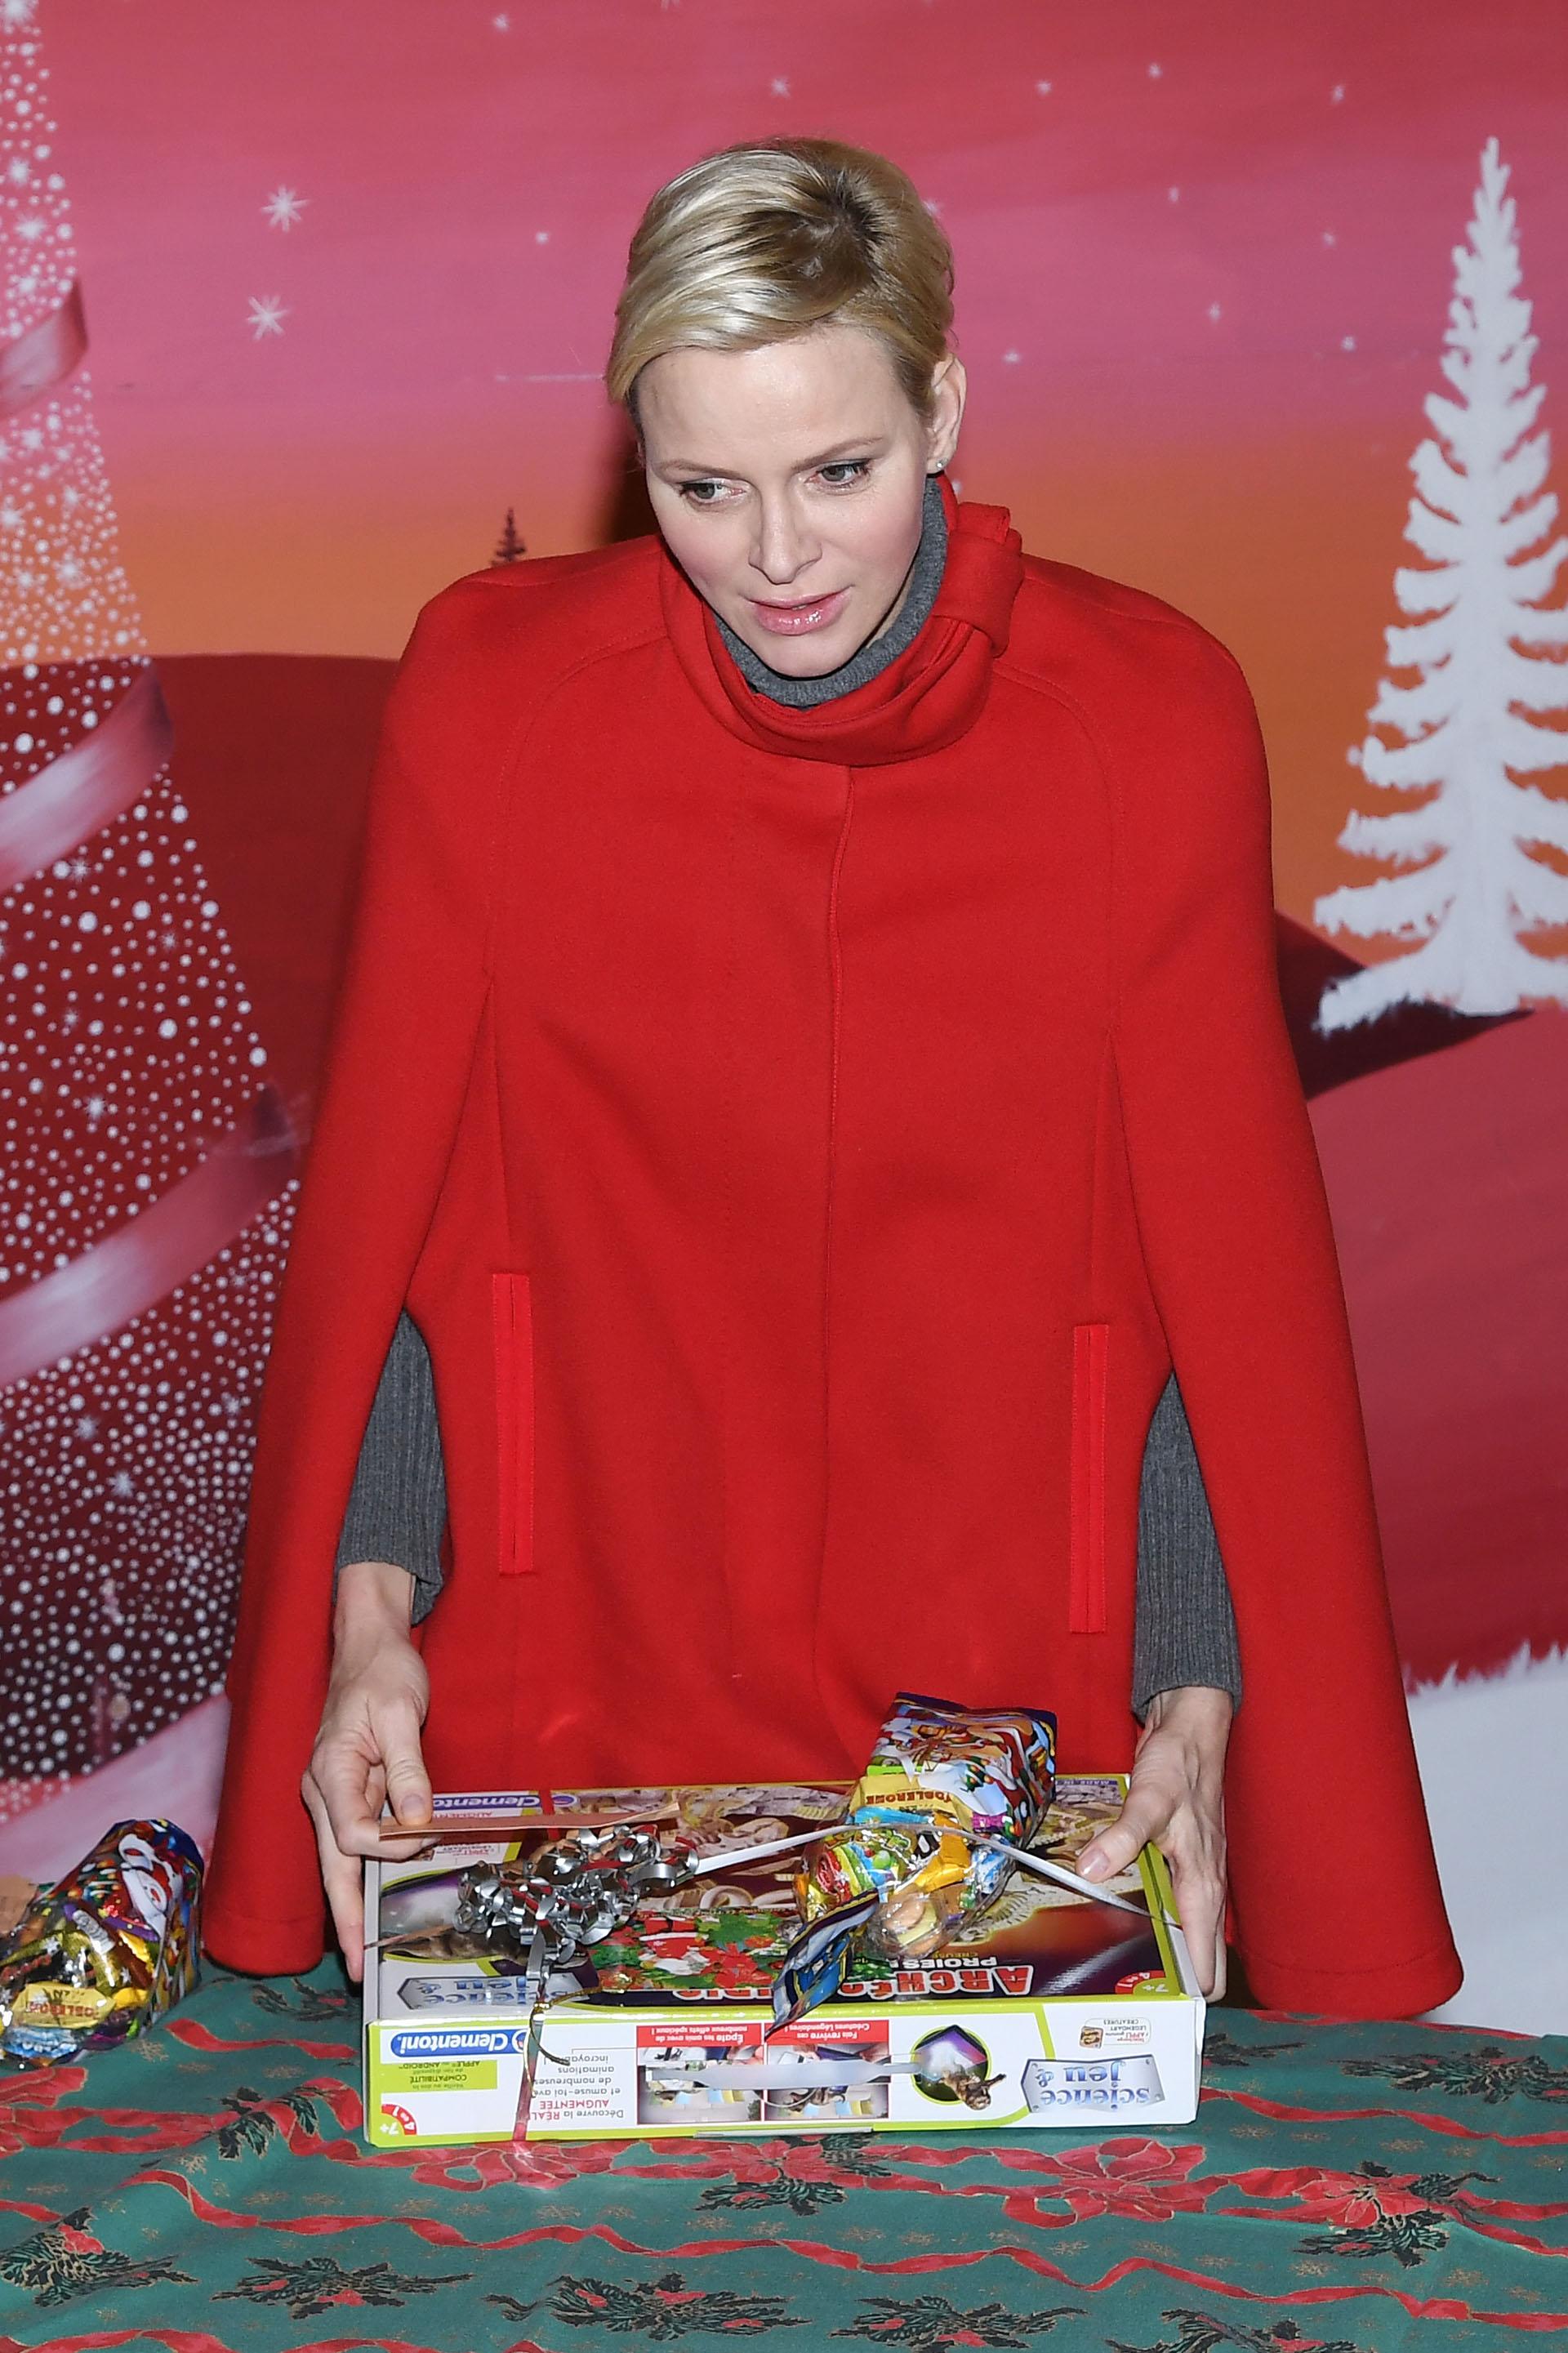 Charlene en plena tarea navideña